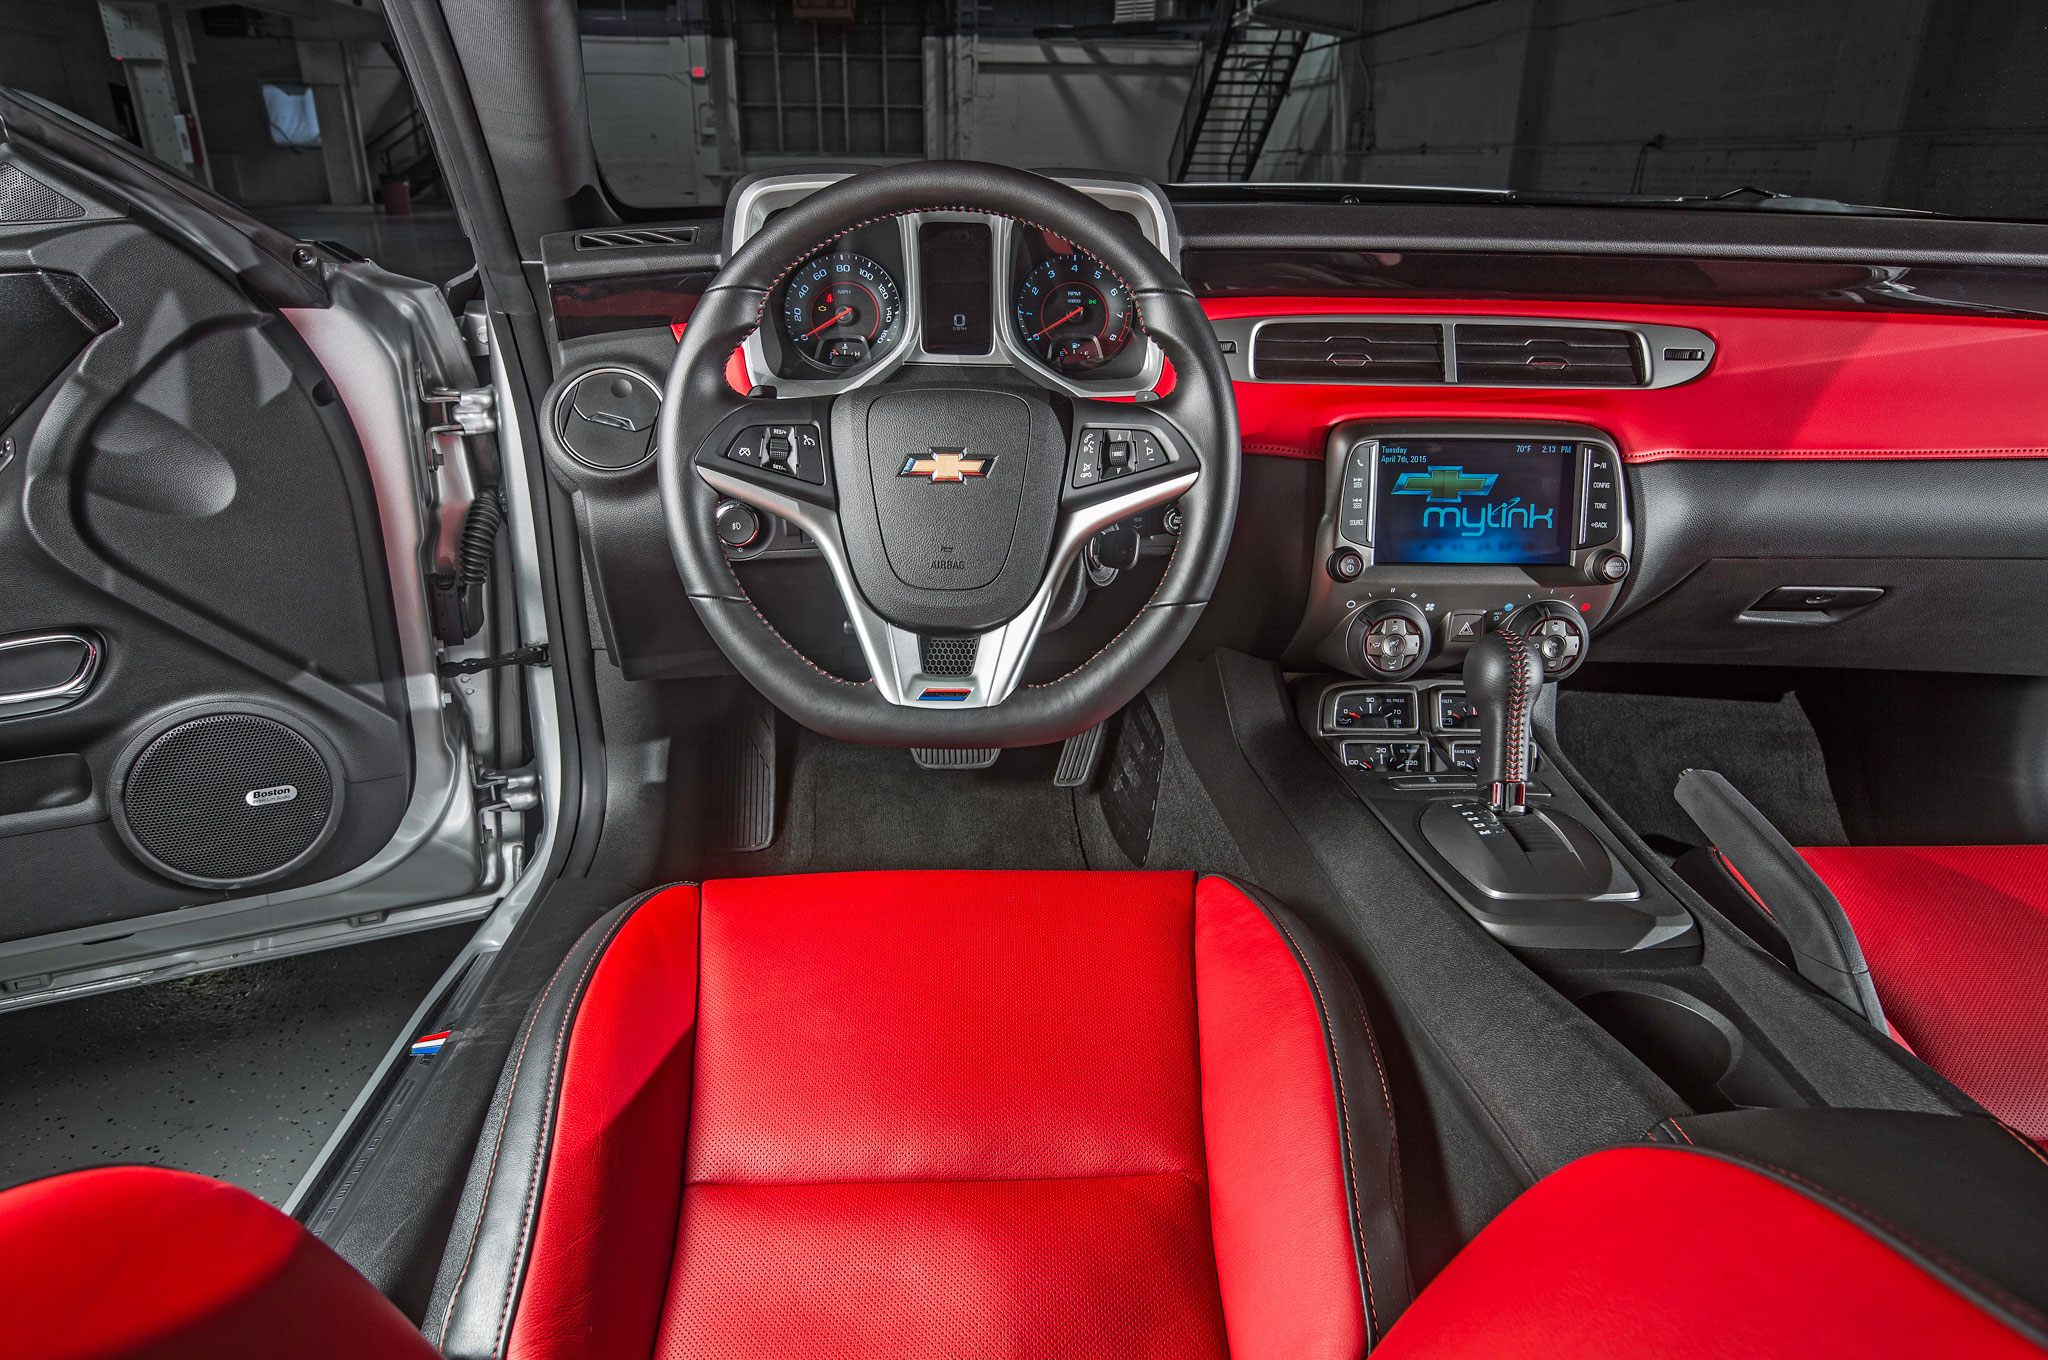 2016 Chevrolet Camaro Revealed Inside The New Sixth Gen